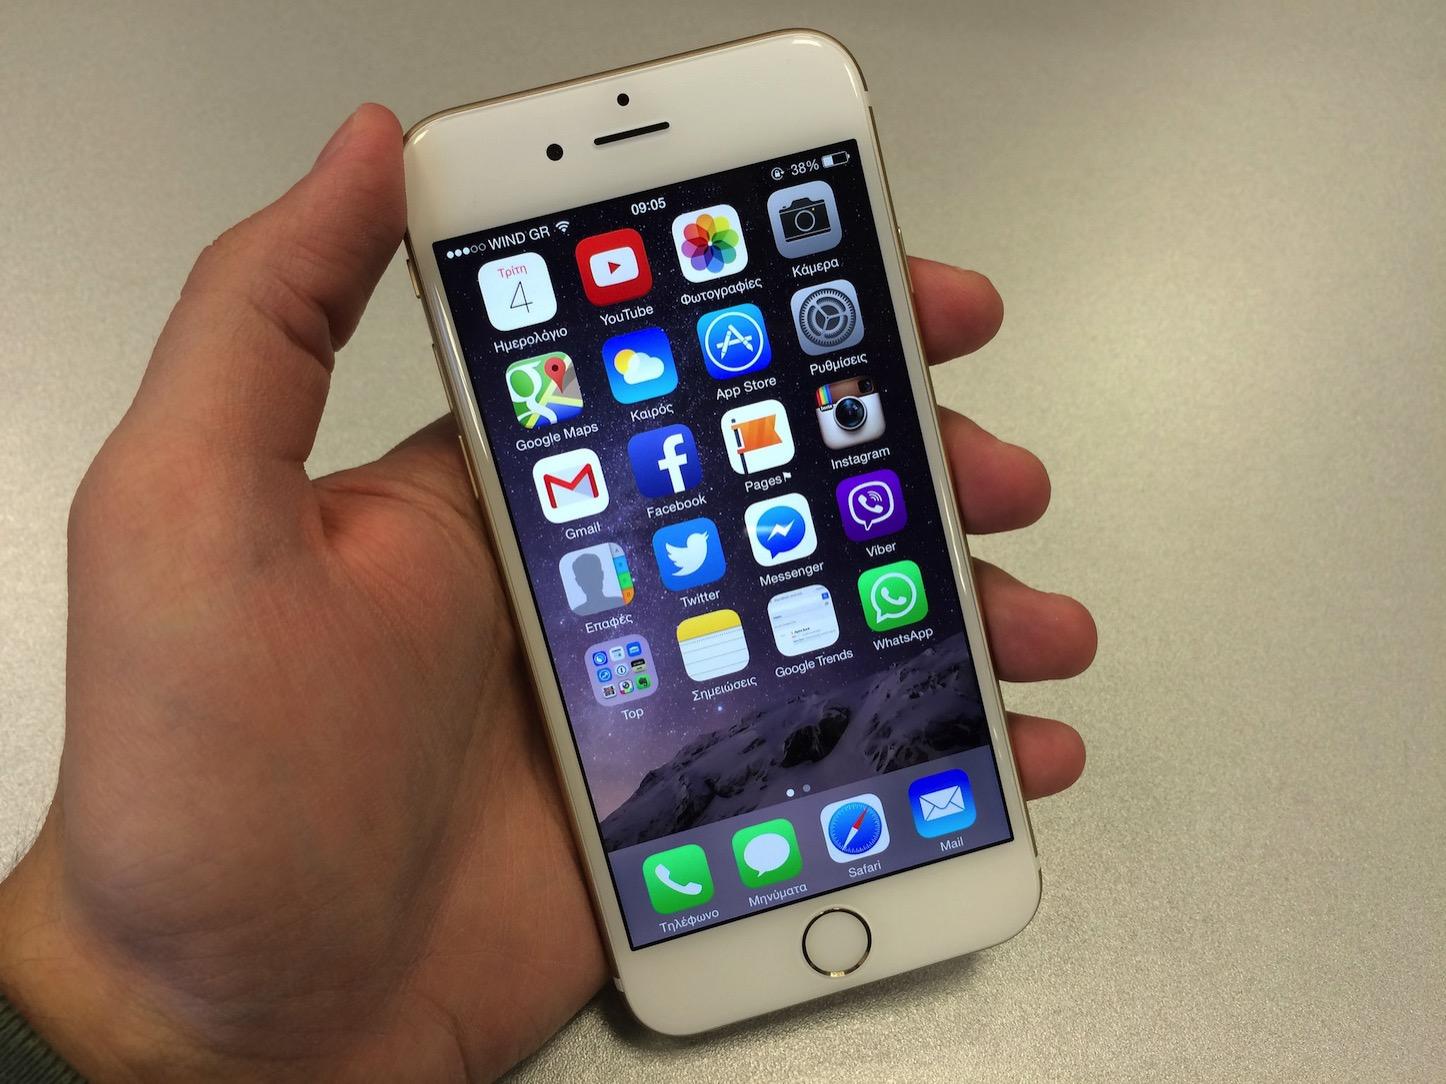 iphone-apps.jpg